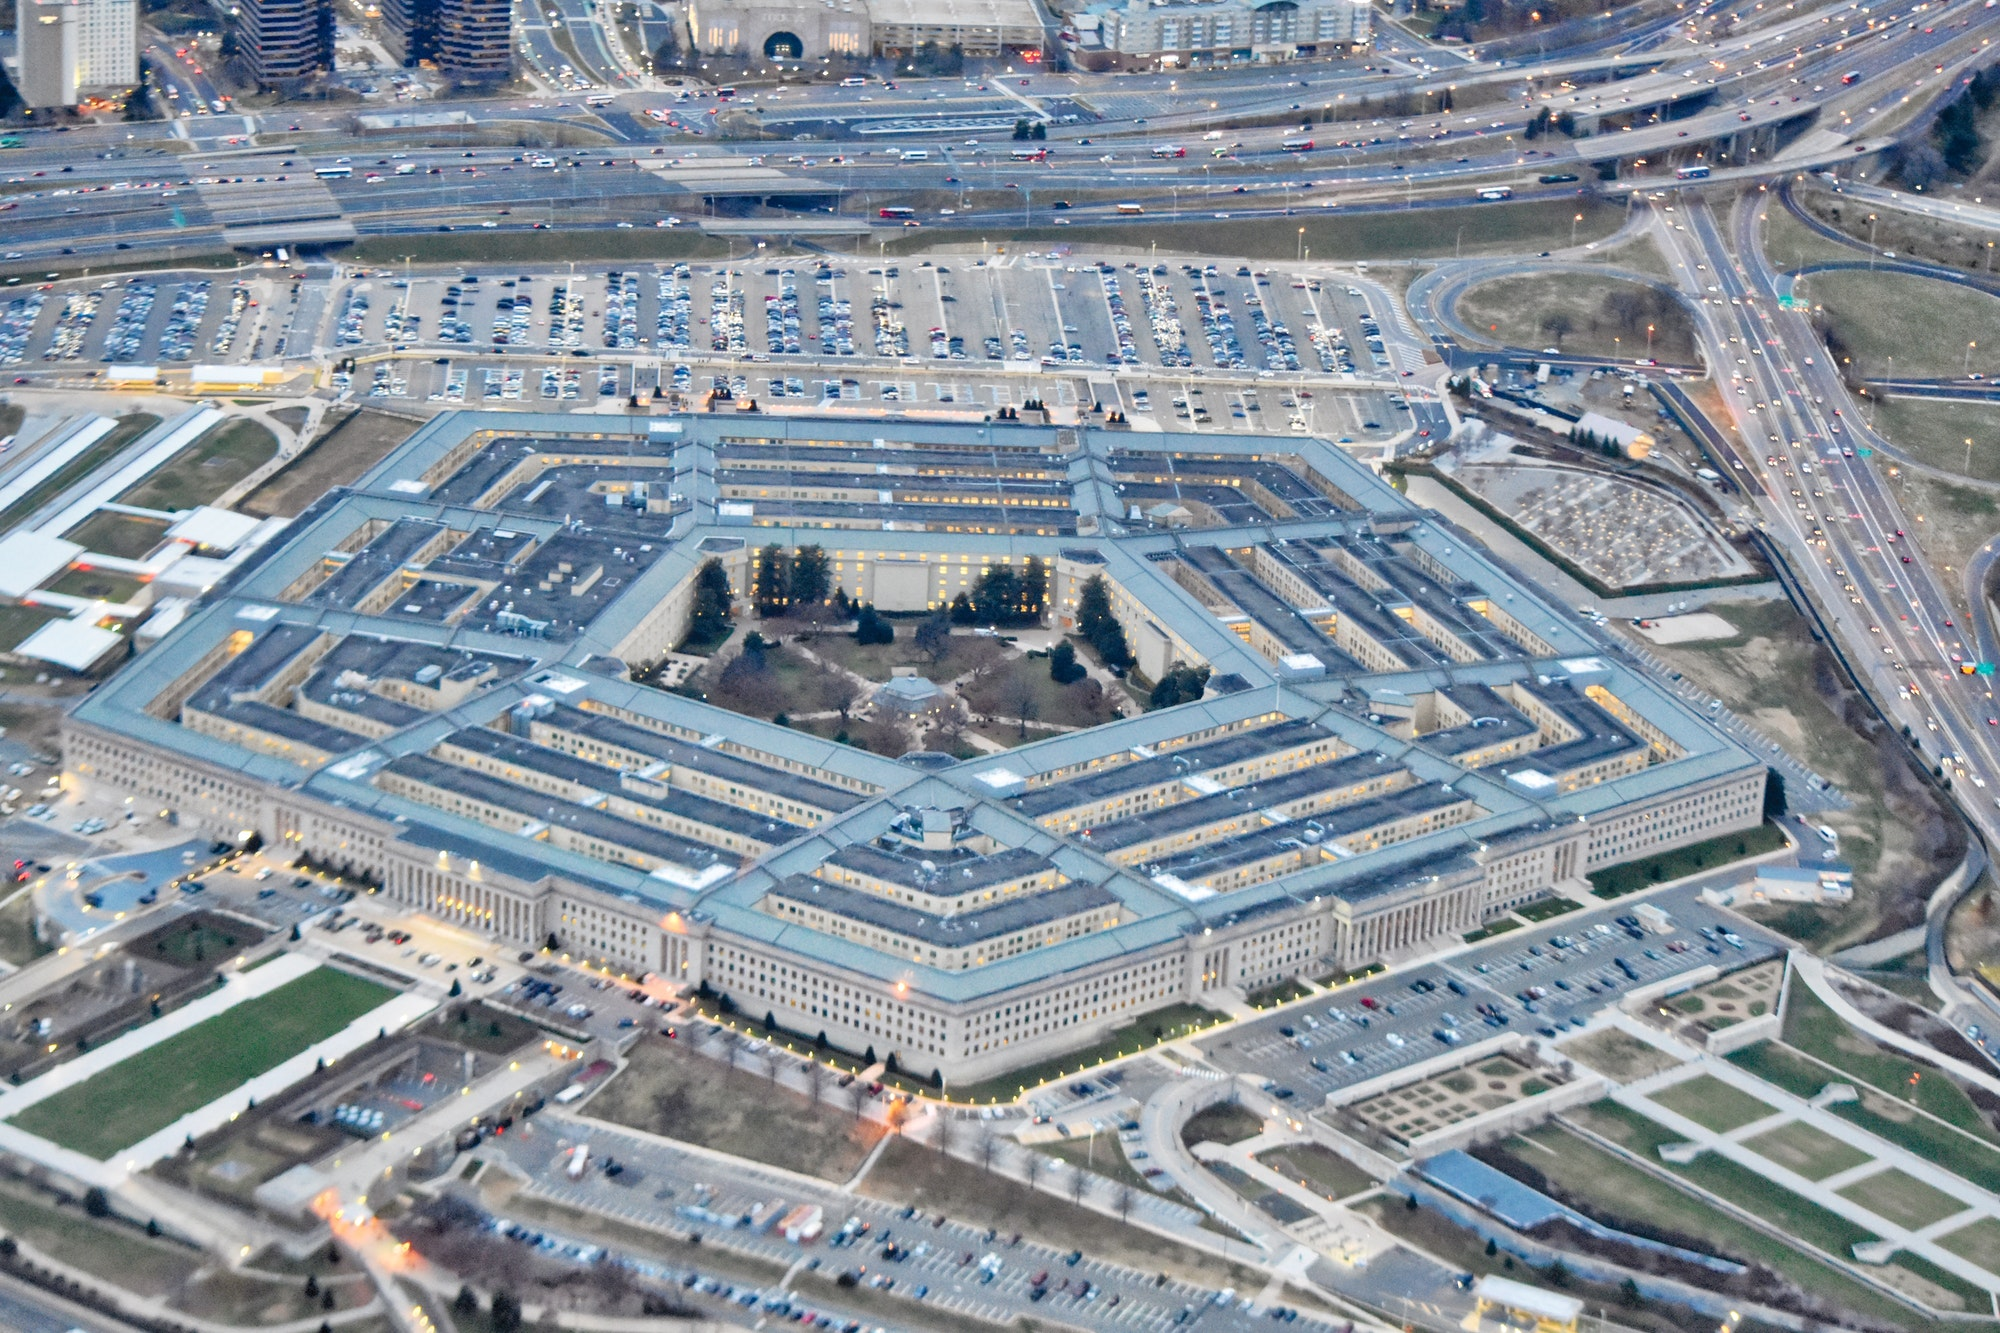 The pentagon in Washington DC